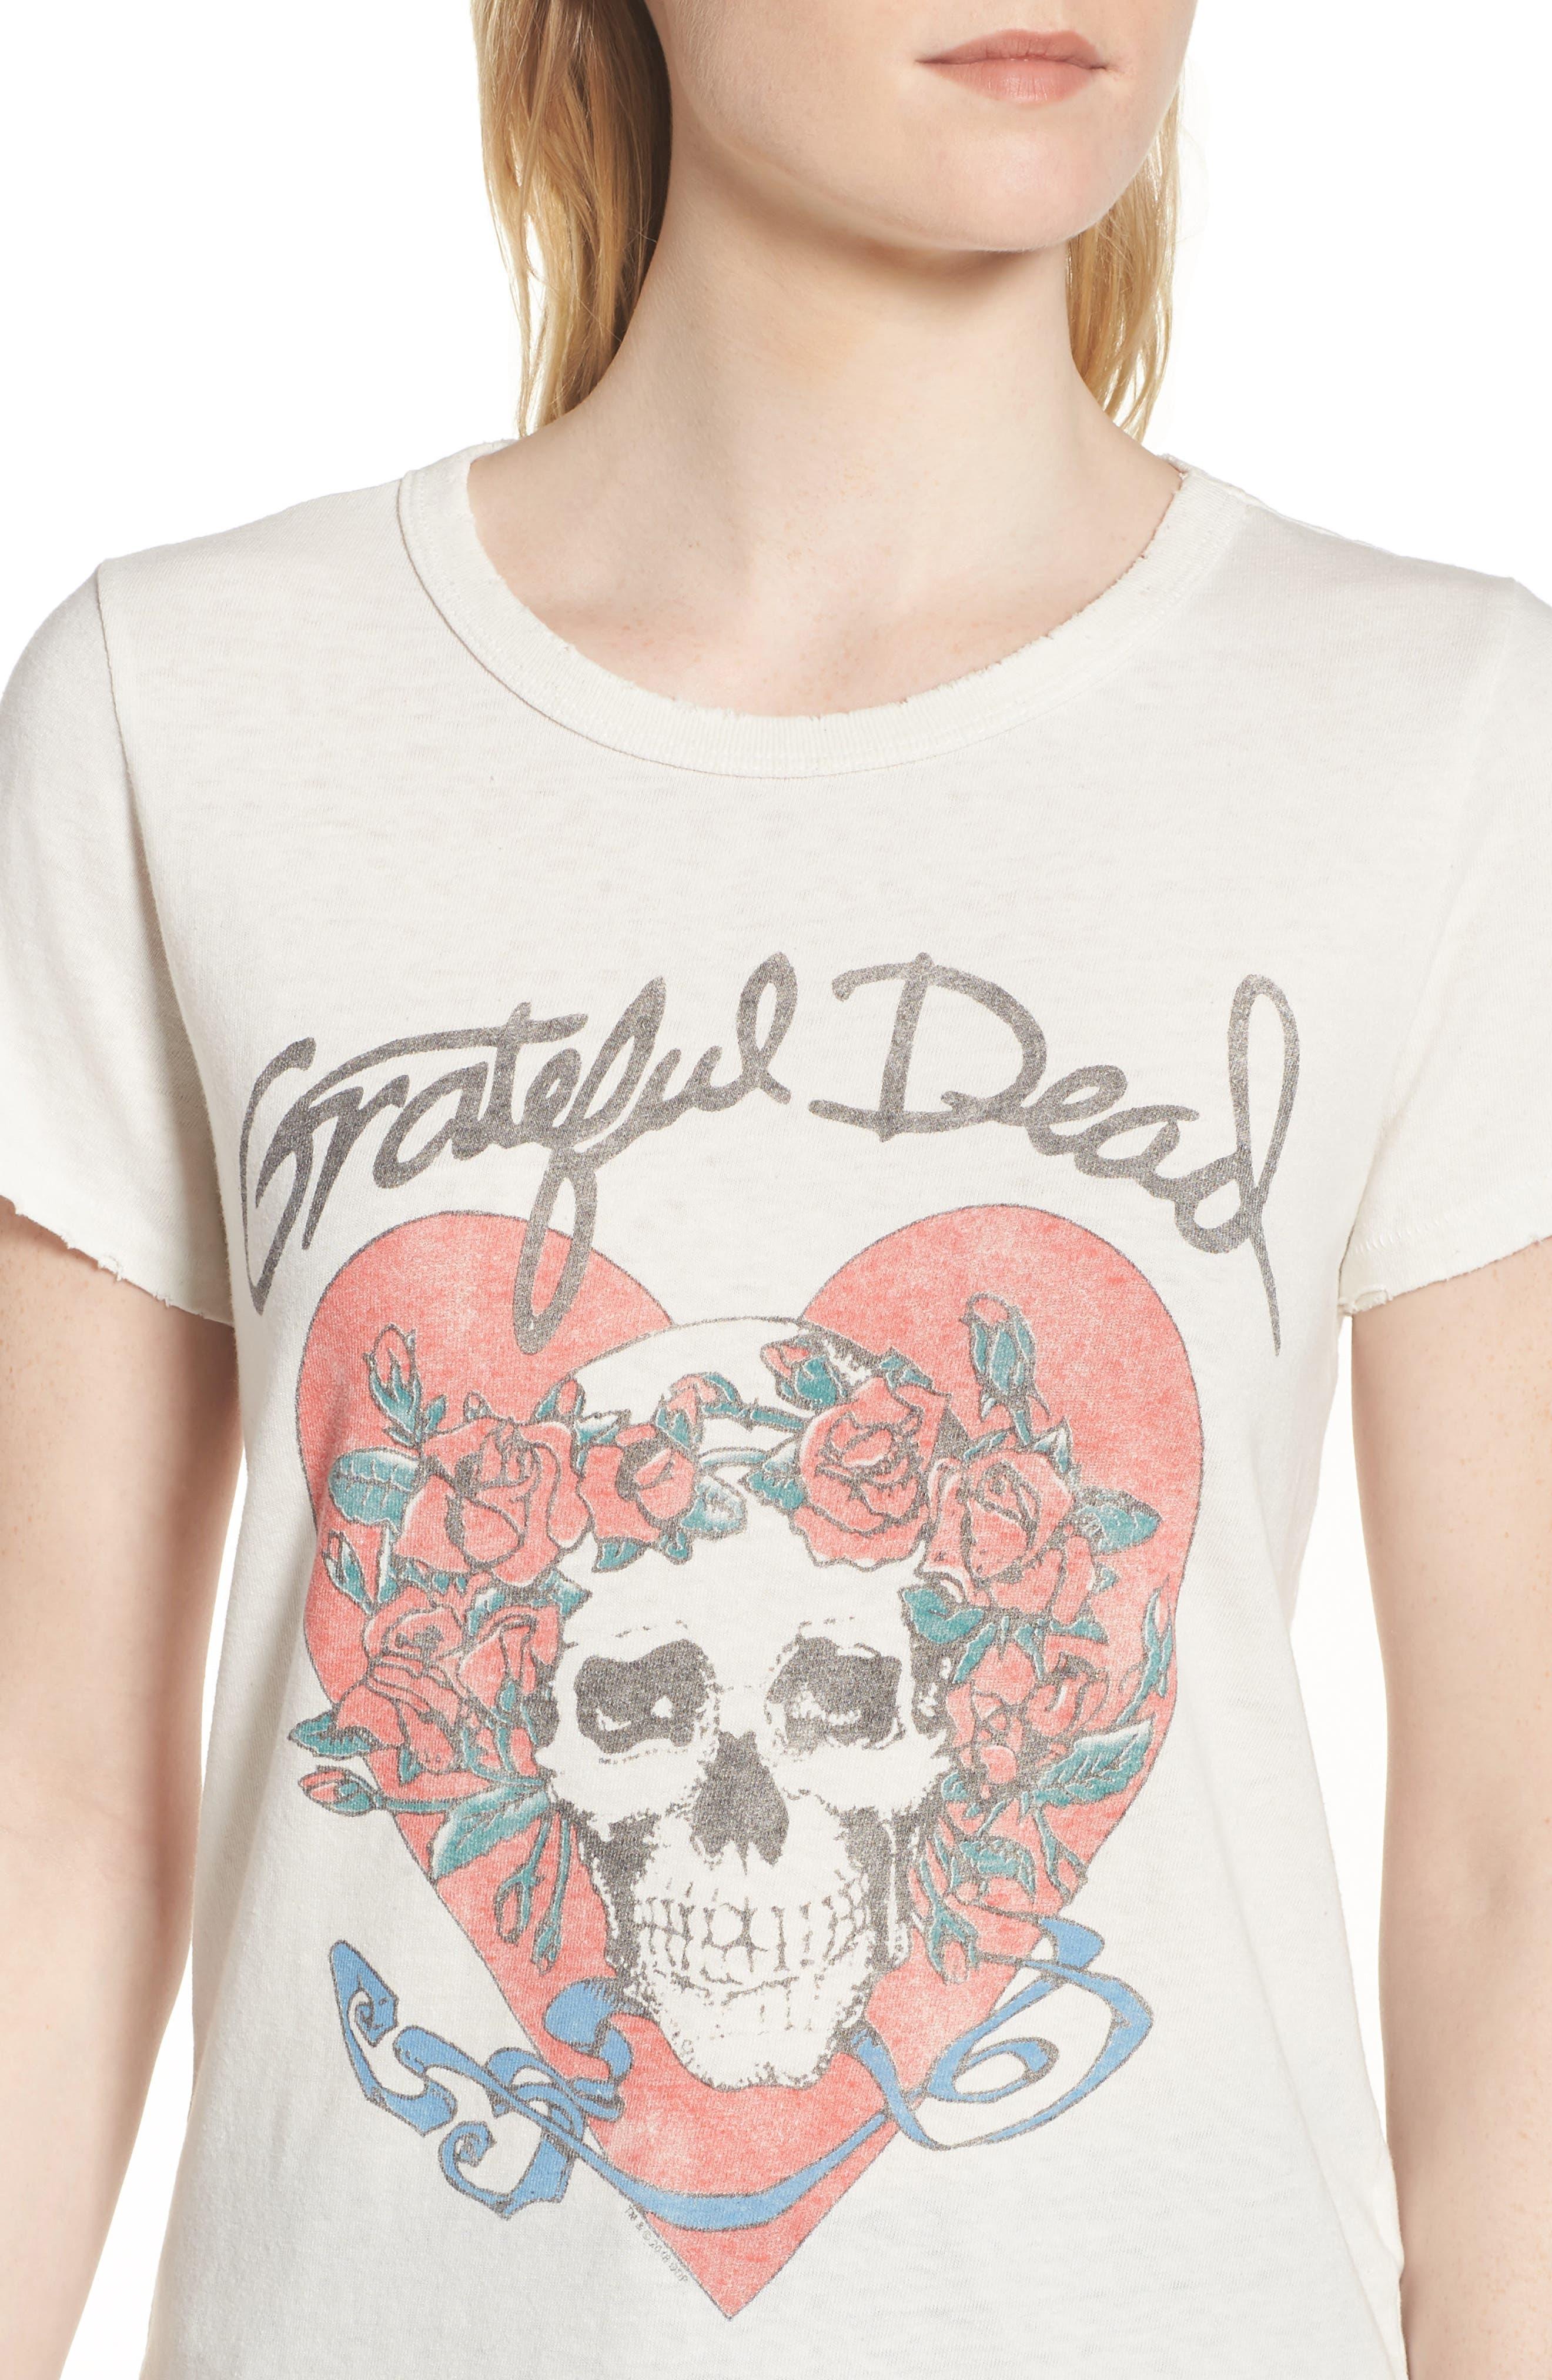 Grateful Dead Tee,                             Alternate thumbnail 4, color,                             Vintage White